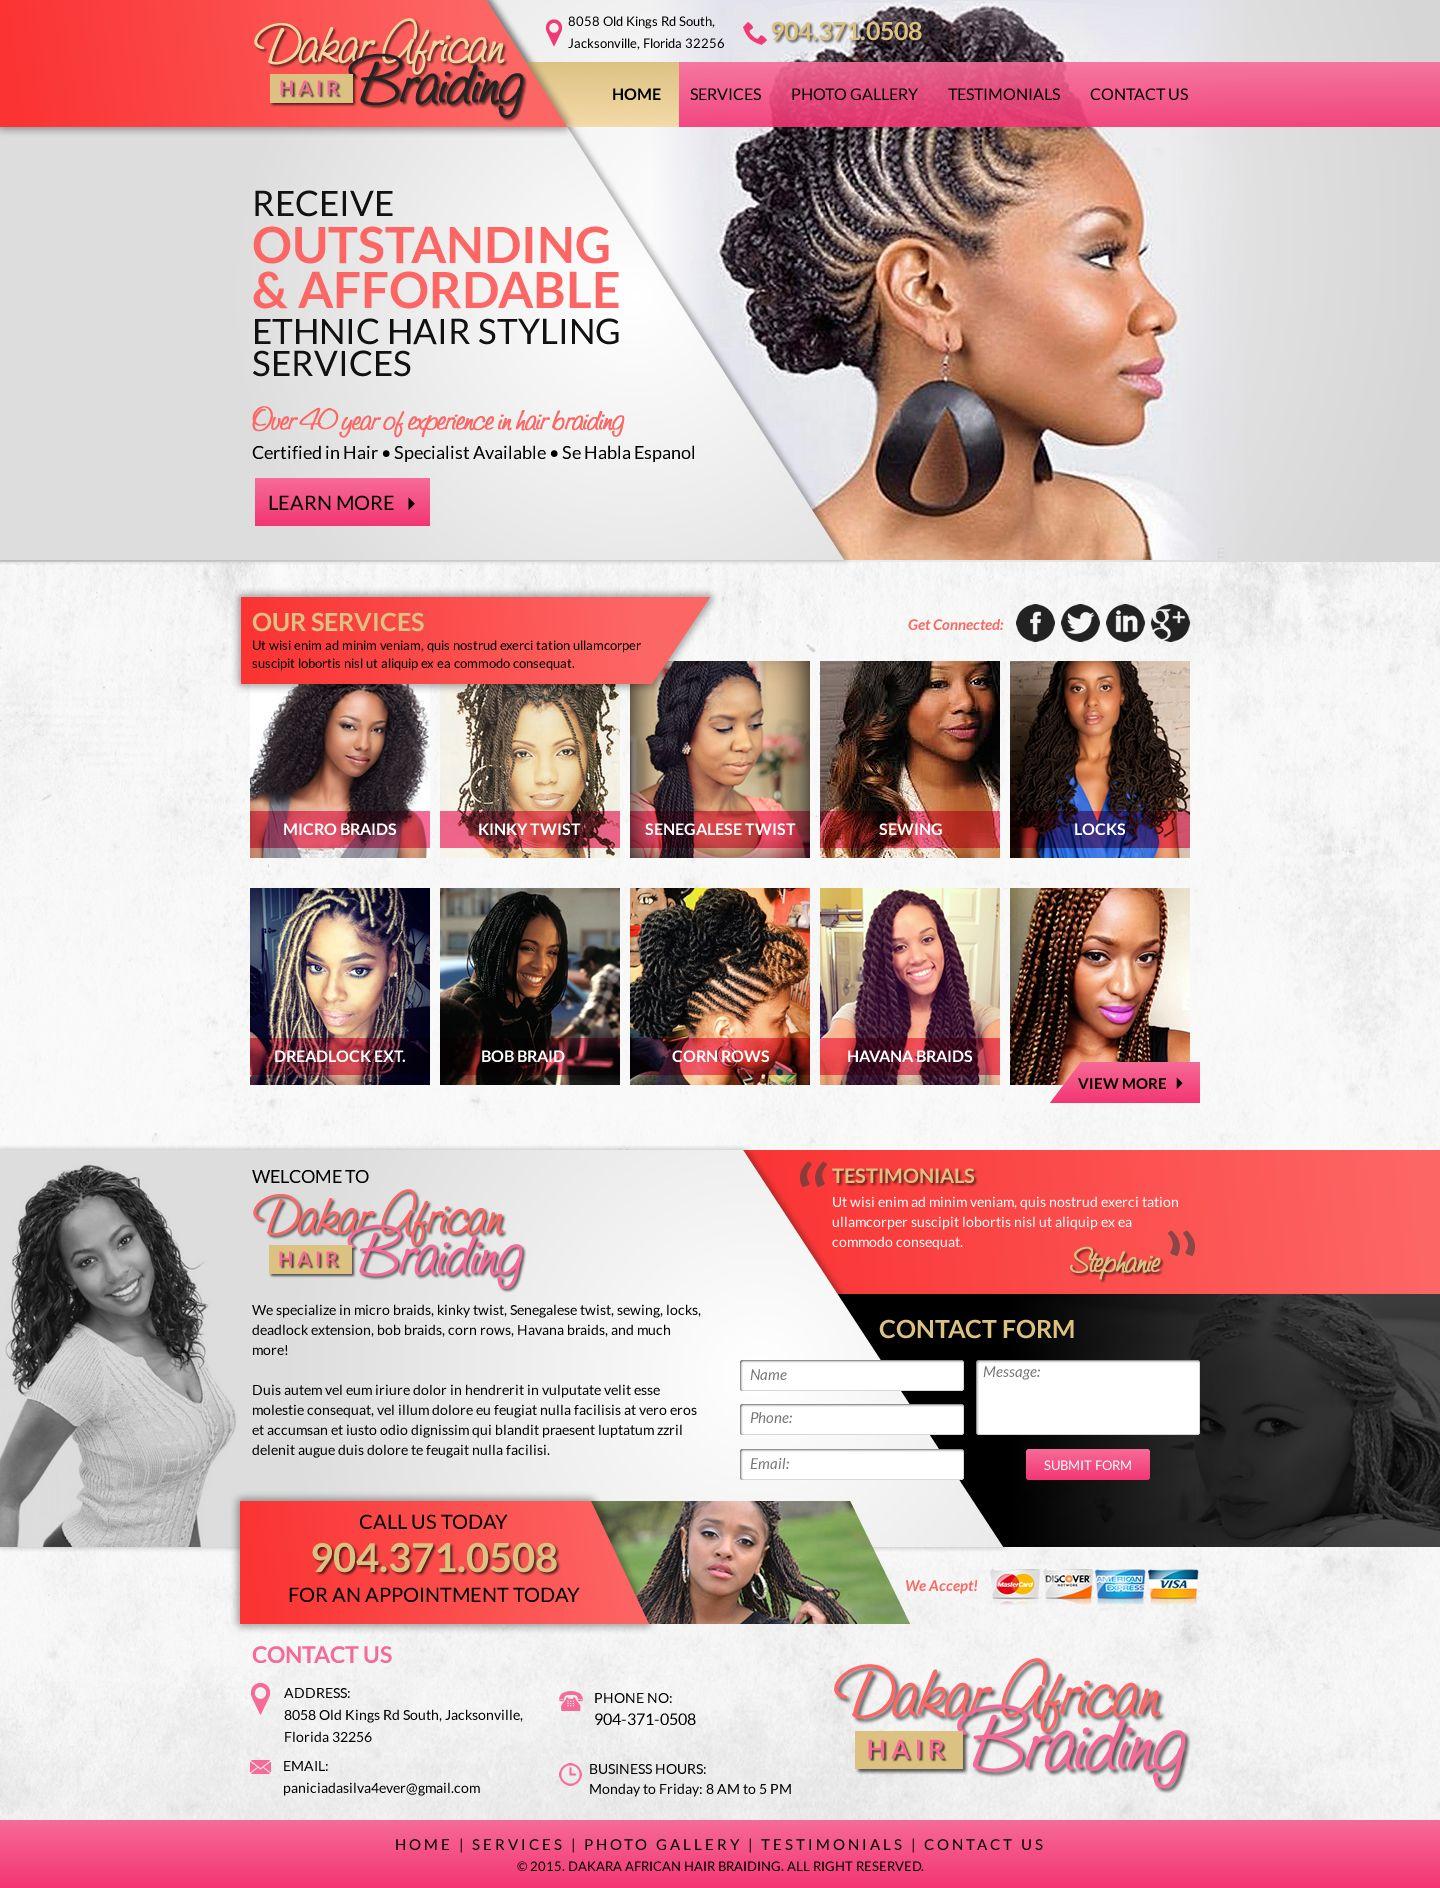 Dakar African Hair Braiding | web designing | African braids ...